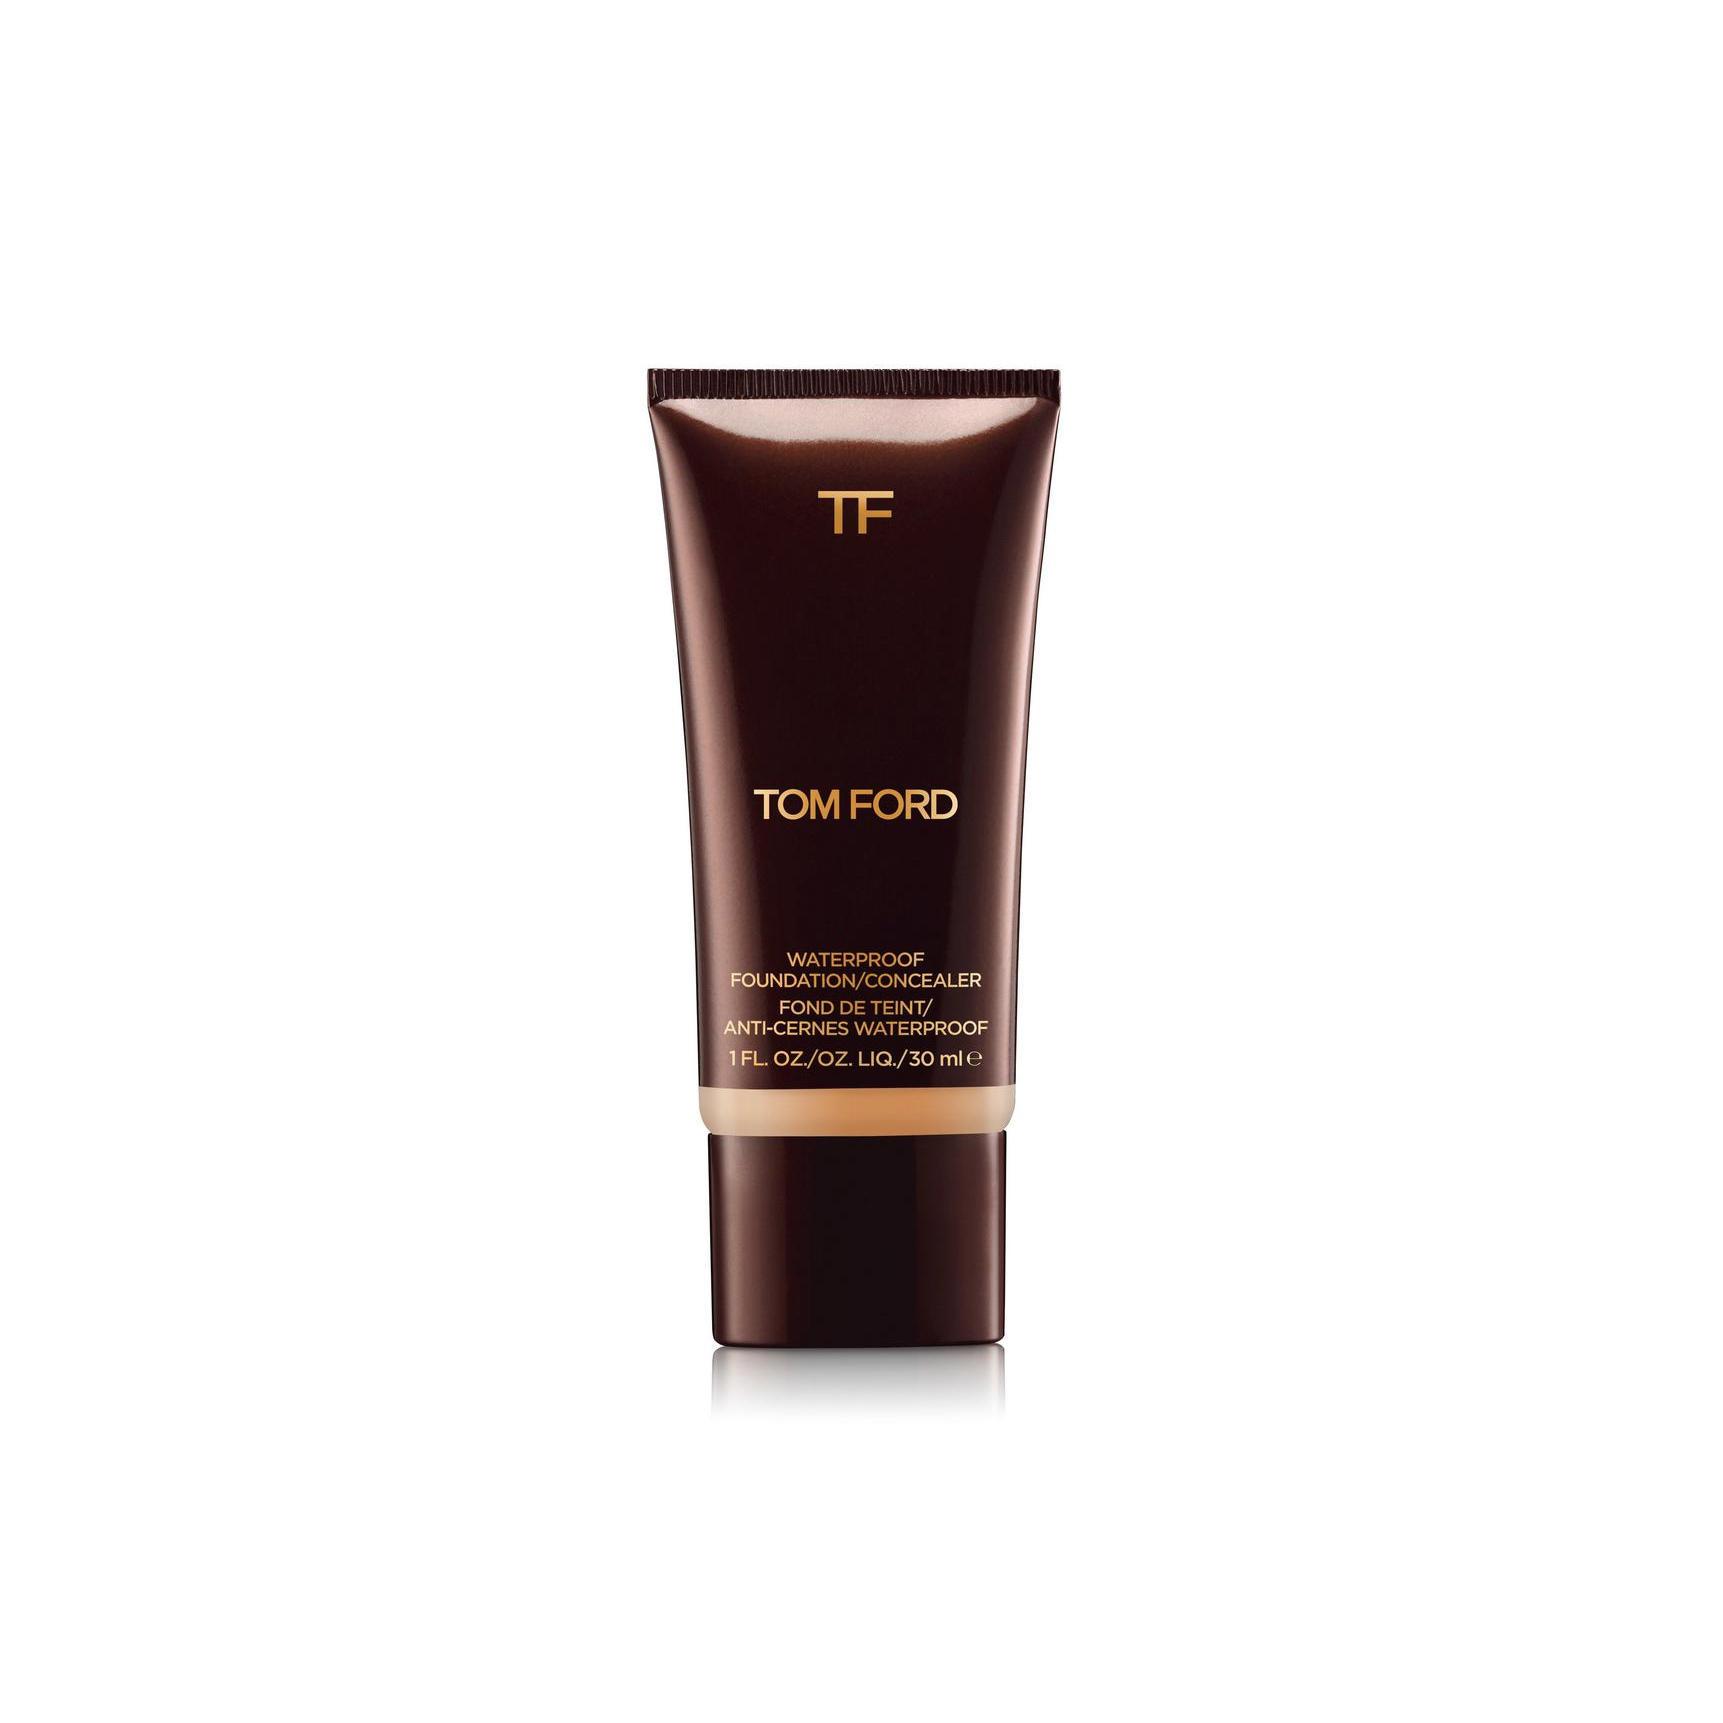 Tom Ford Waterproof Foundation/Concealer Tawny 7.0